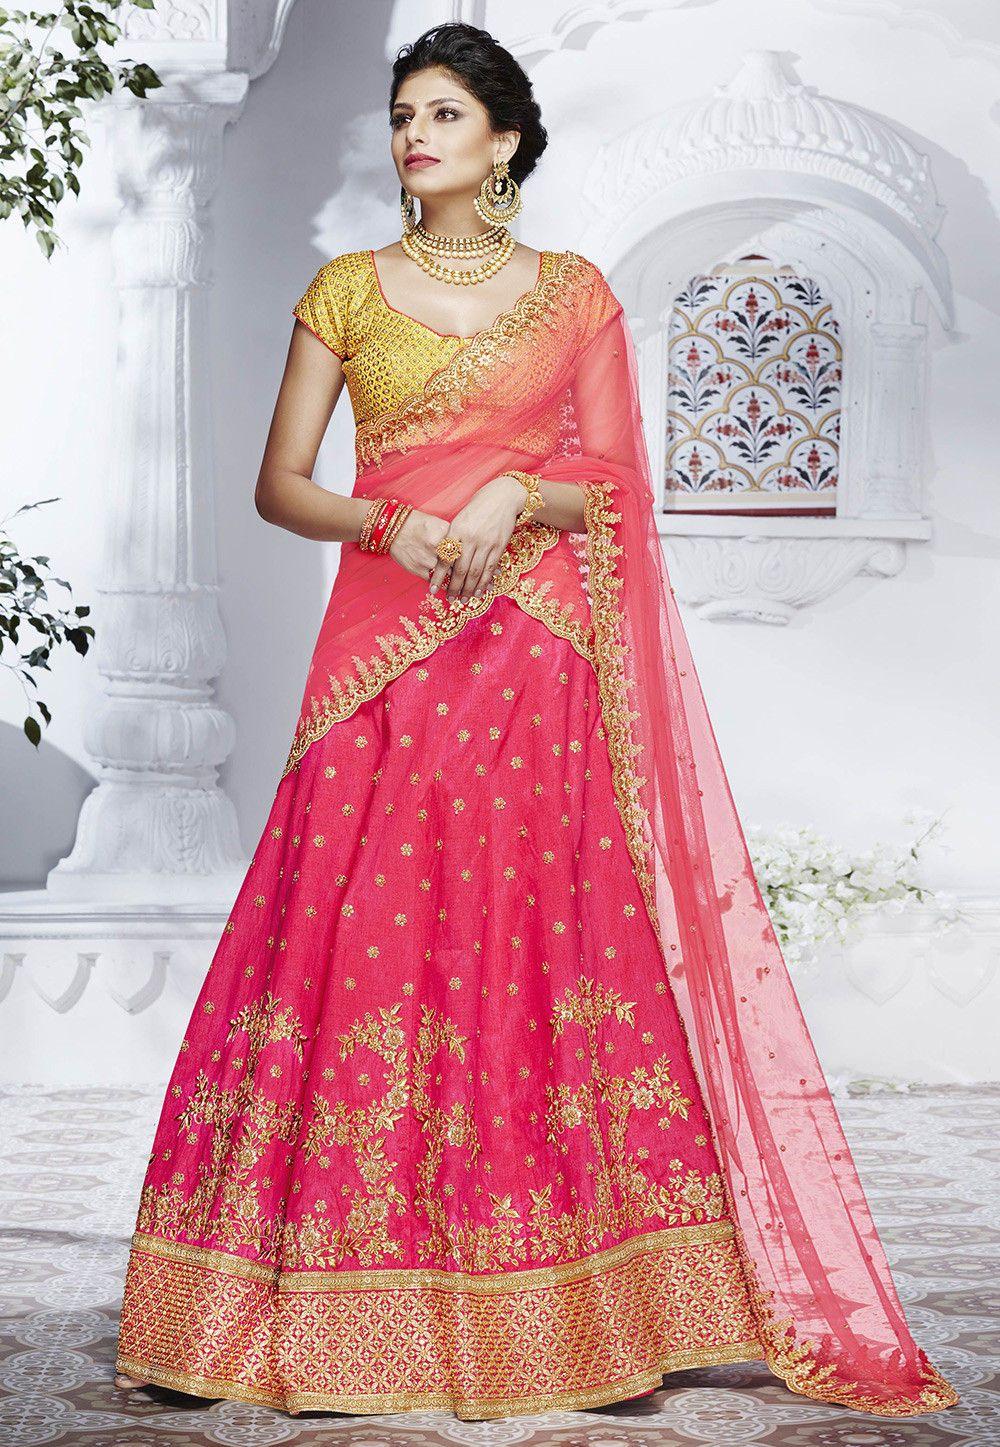 7602e50de1 Buy Embroidered Handloom Art Silk Lehenga in Fuchsia online, Item code:  LQM152, Color: Pink, Occasion: Wedding, Work: Resham, Stone Work,  Traditional, Zari, ...